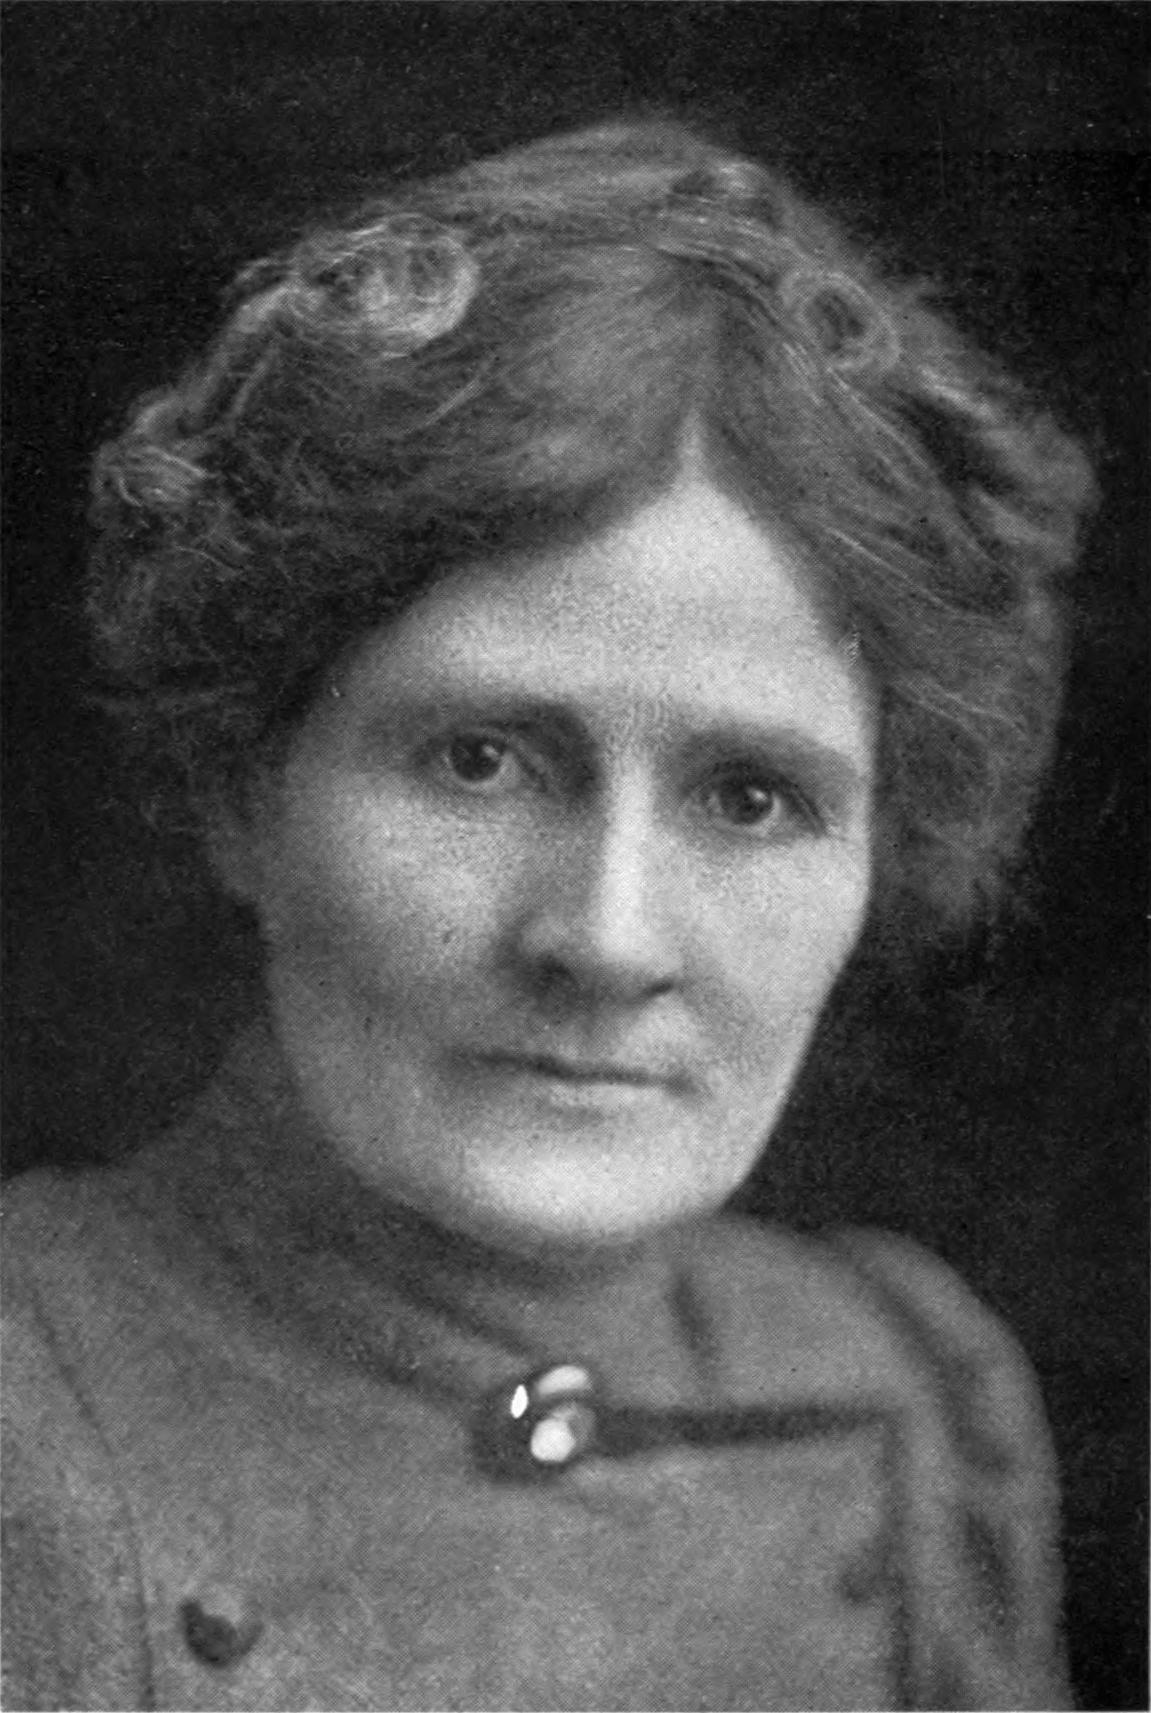 Dr. Linda Hazzard